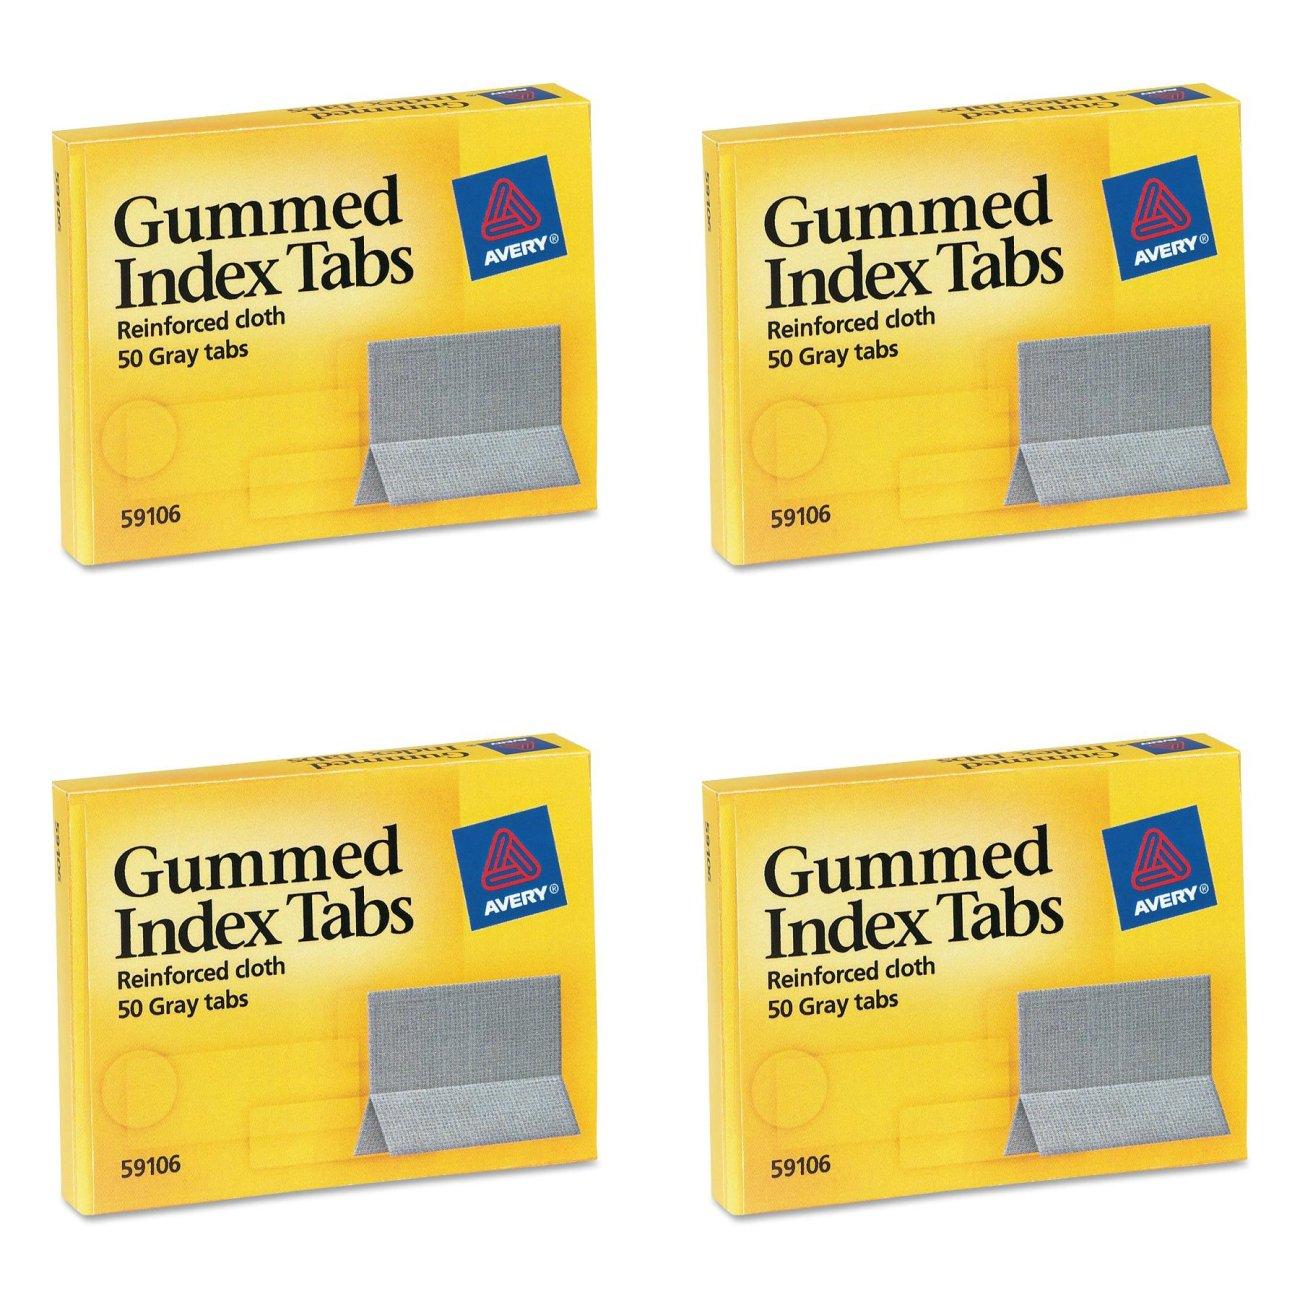 Avery Gummed Index Tabs, 50 Tabs (59106), 4 Packs